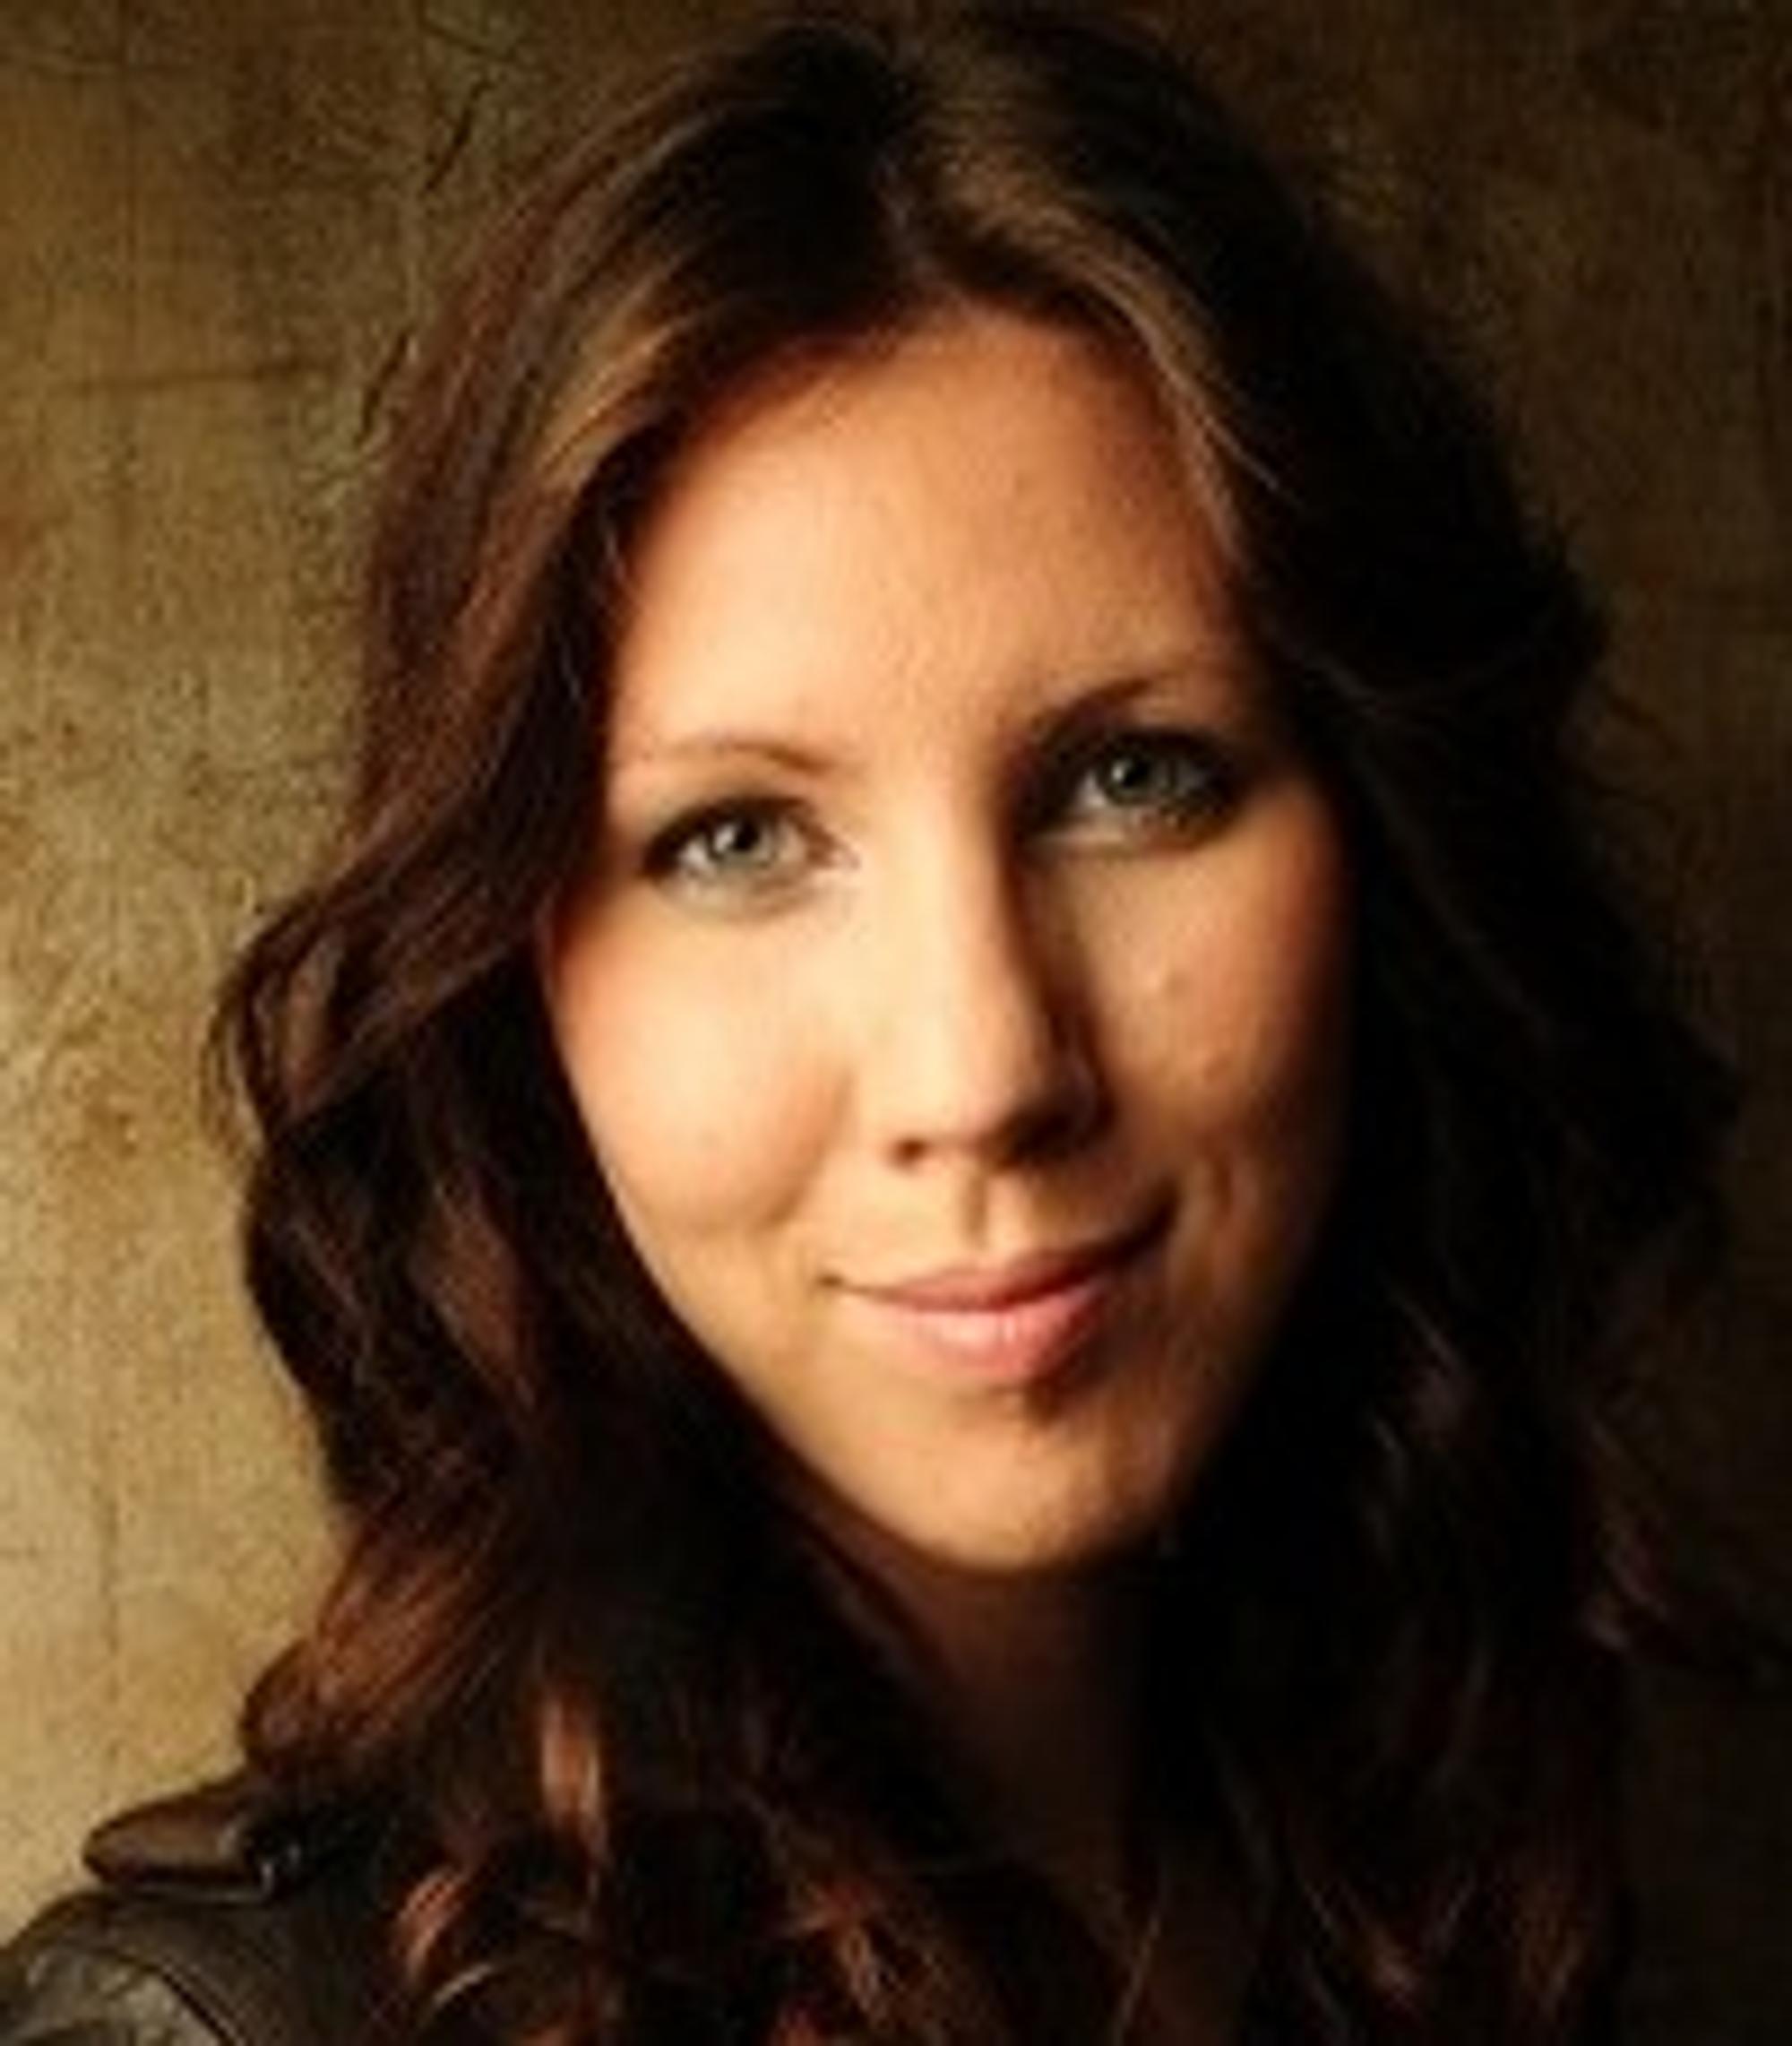 Linda Kiby hos Paradox Interactive er sjefsprodusent for East vs. West.